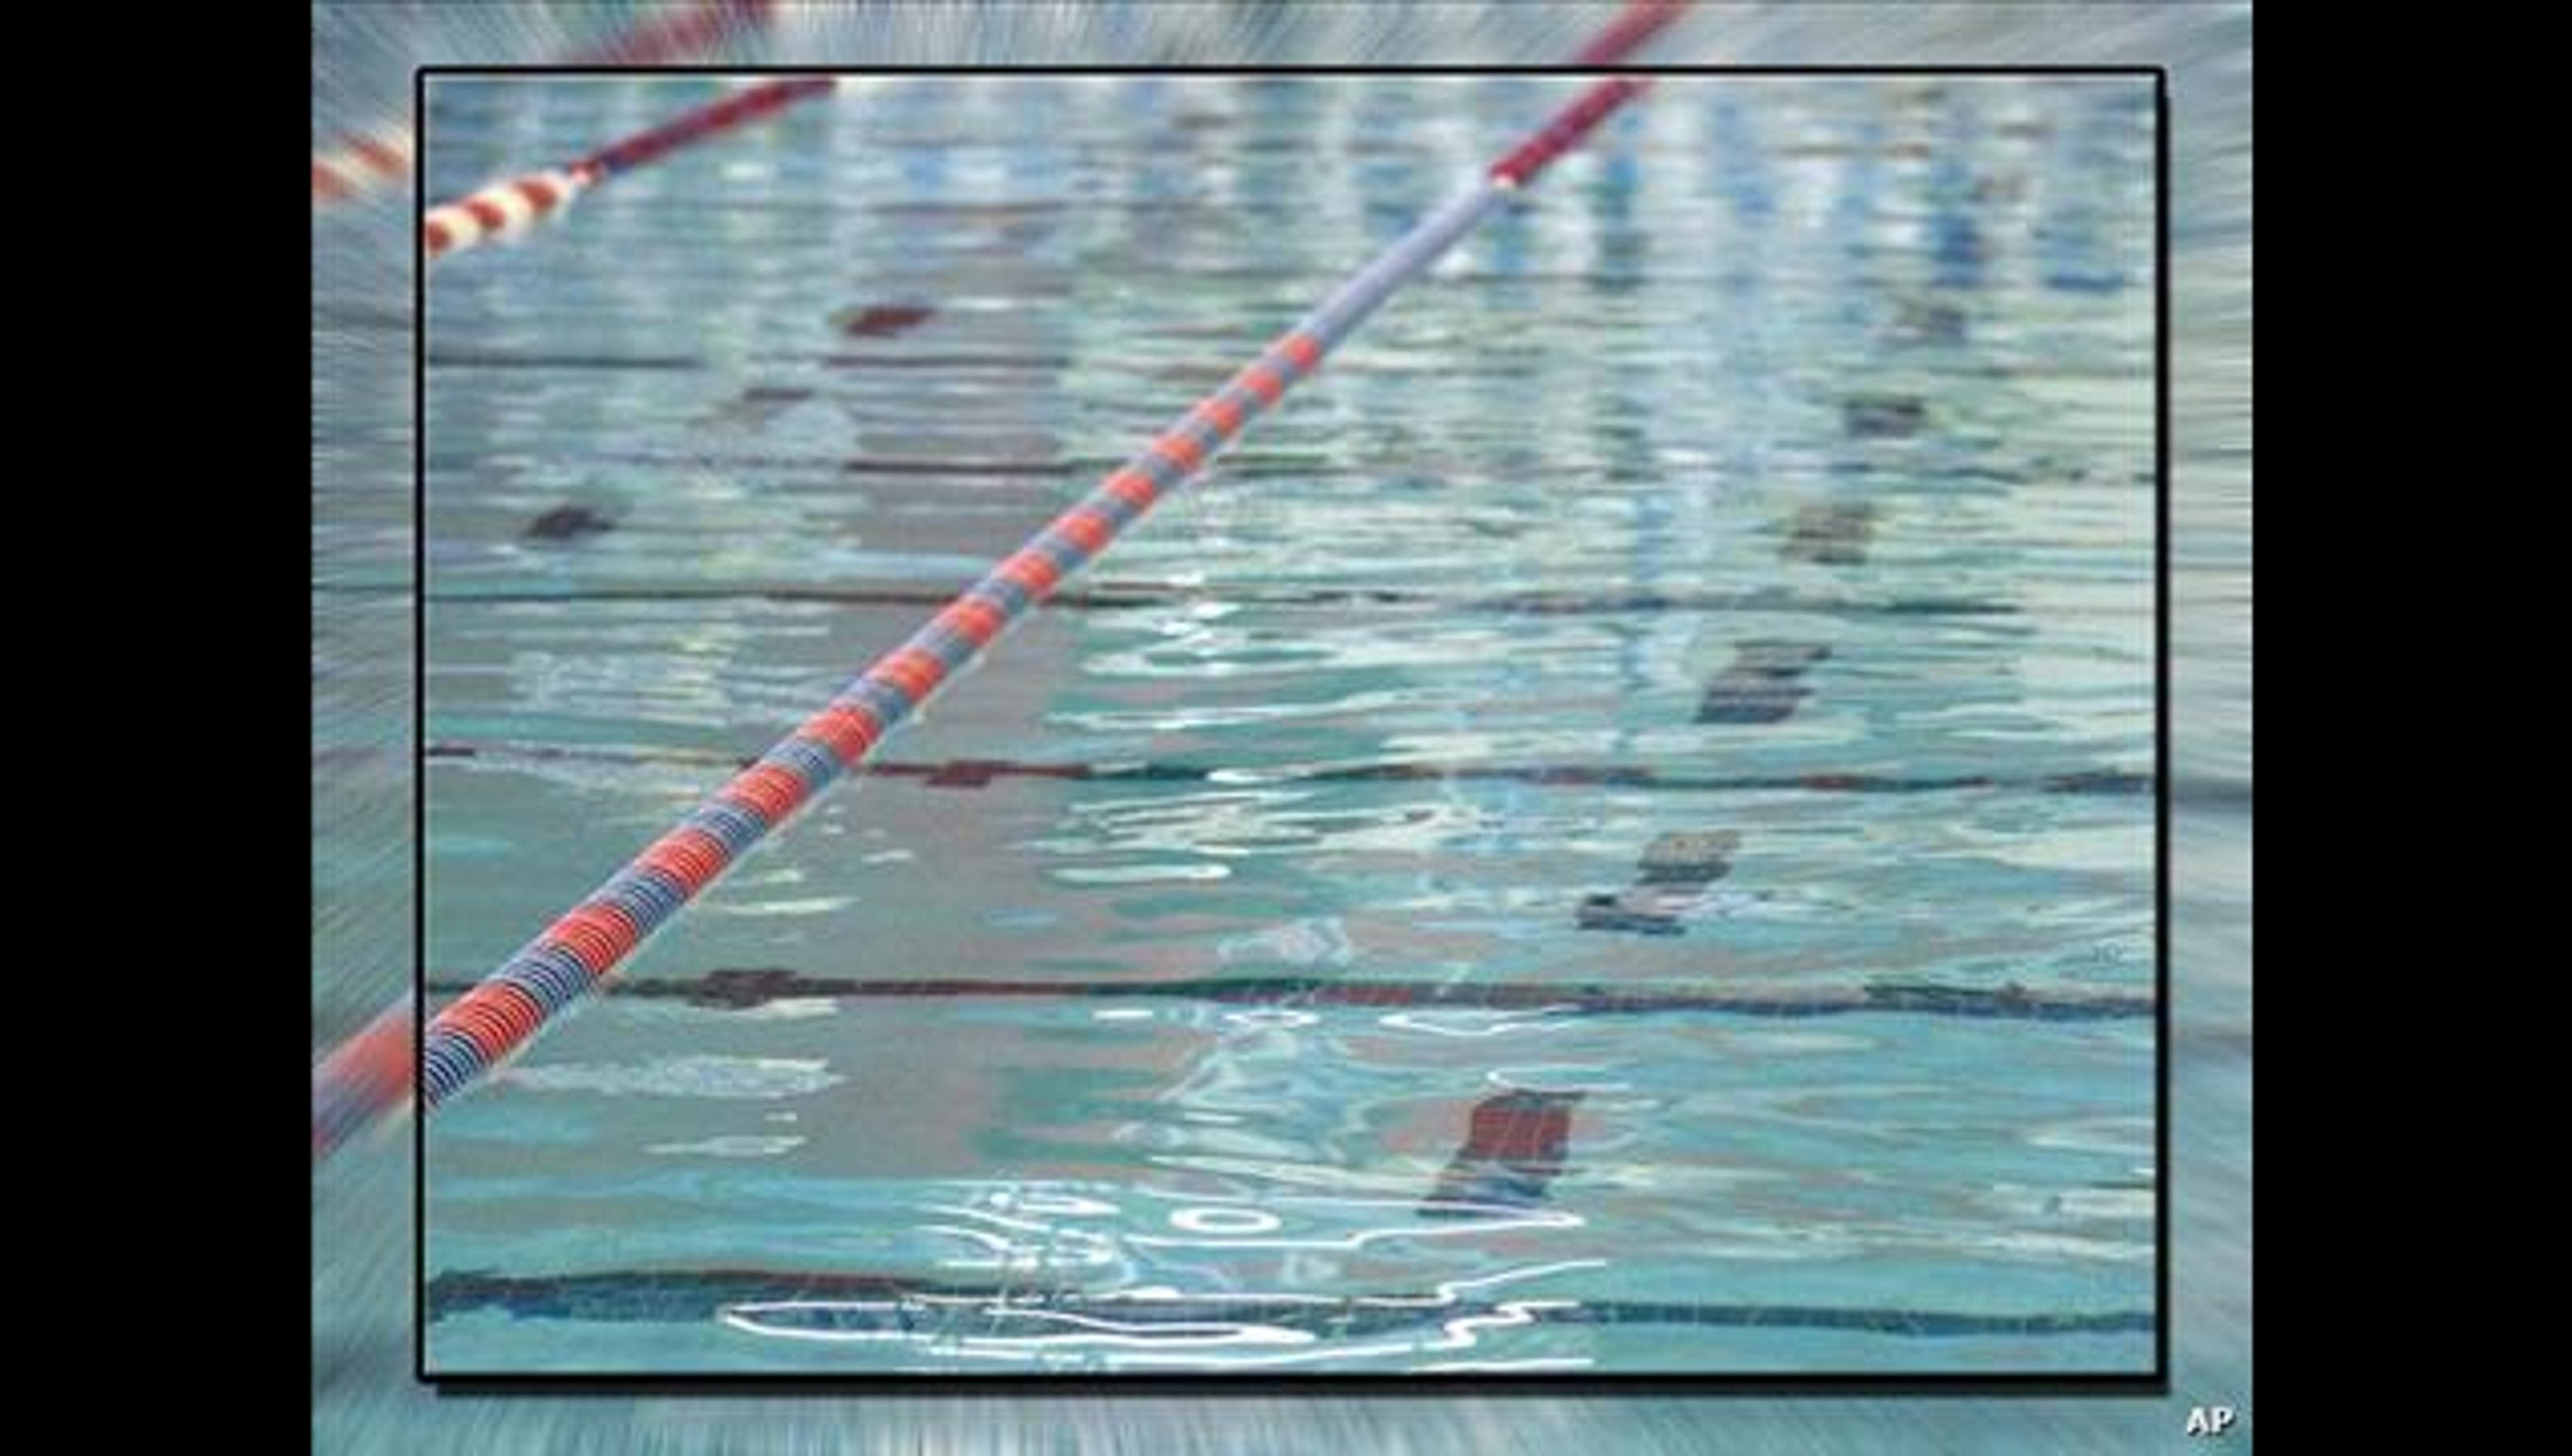 Swim 2 Live Program Helps Prevent Drowning